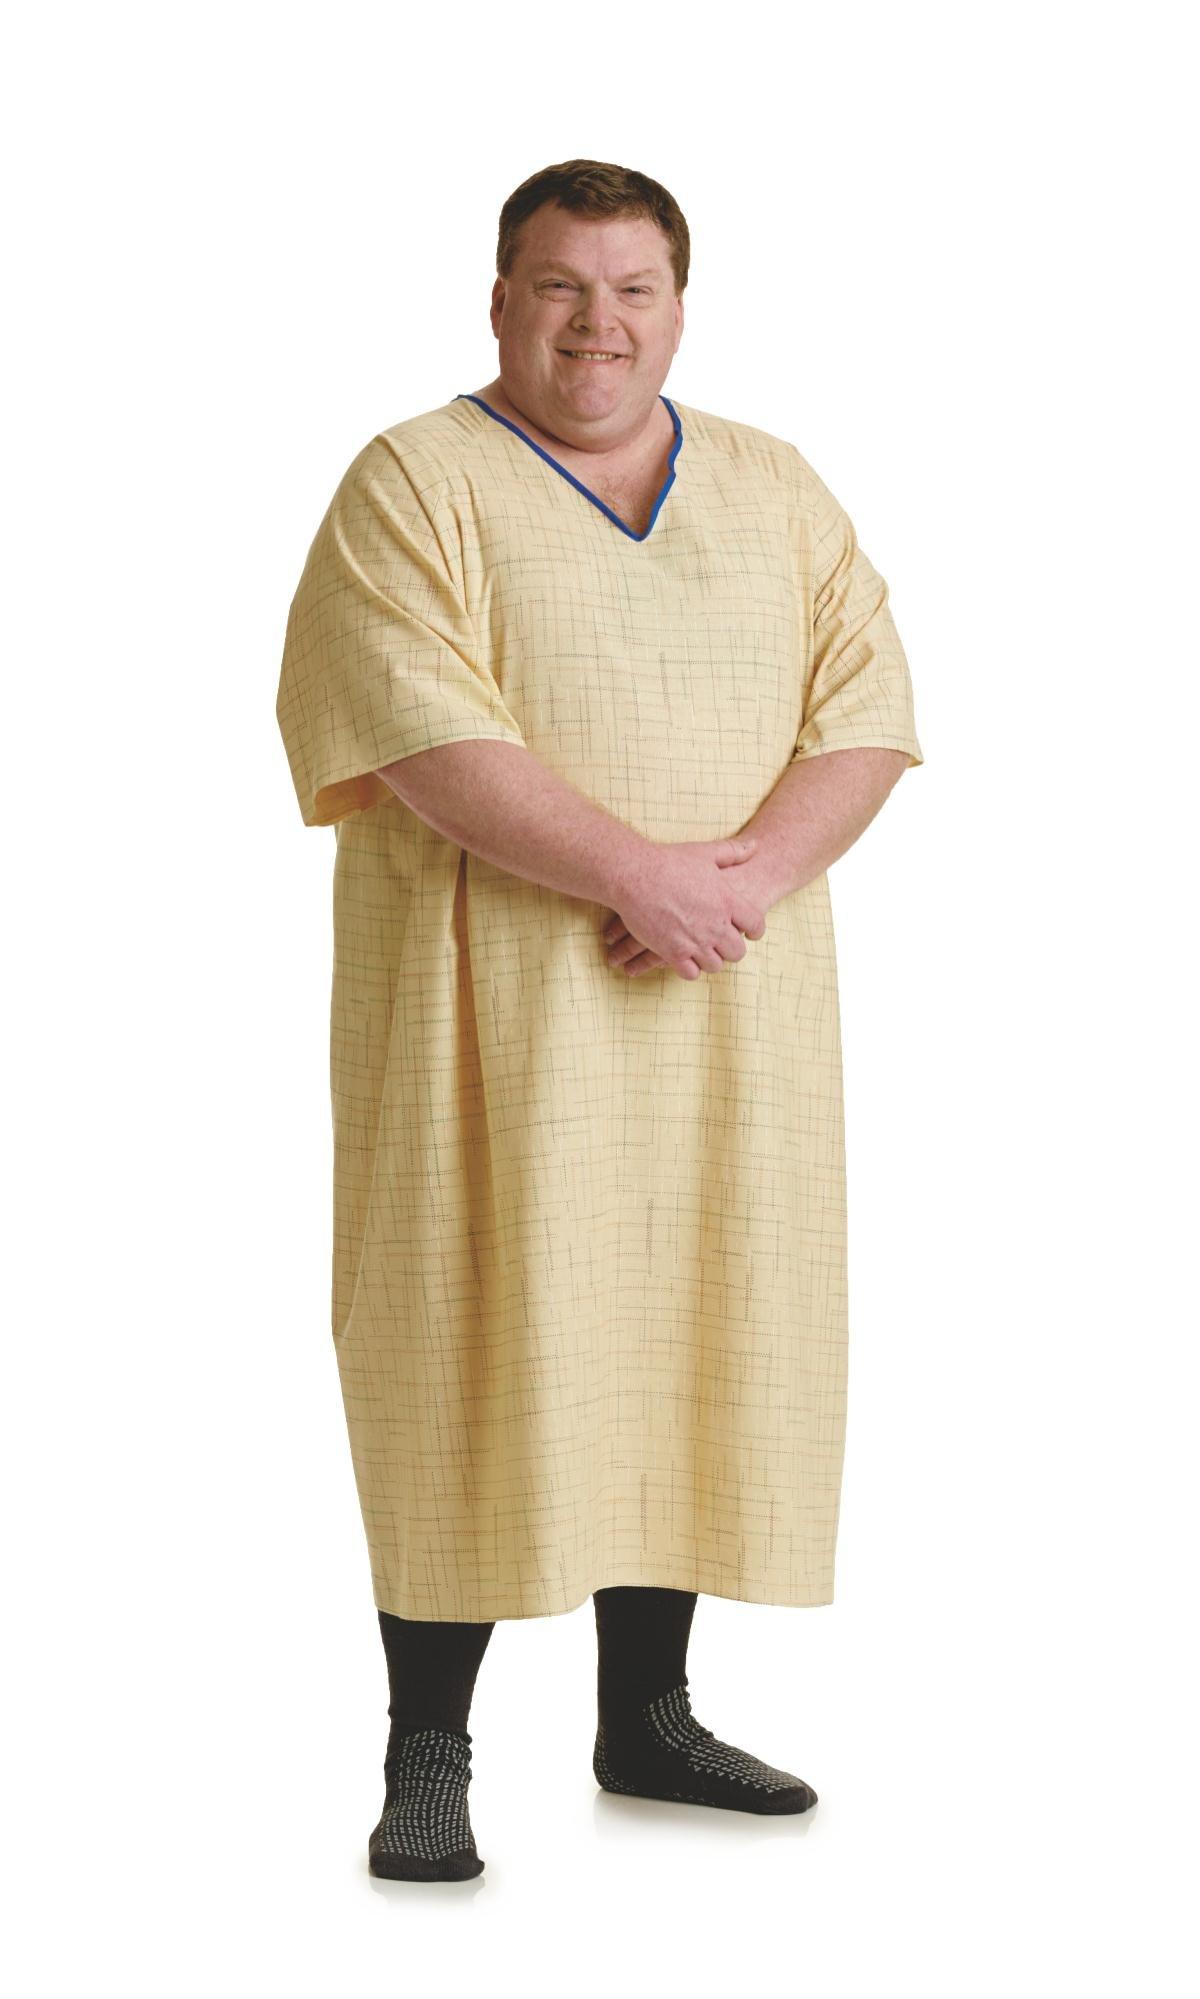 Medline MDTBG5RTSSPY Deluxe Cut Patient Gowns, Tieside, 10X-Large, Spectrum Yellow (Pack of 12)